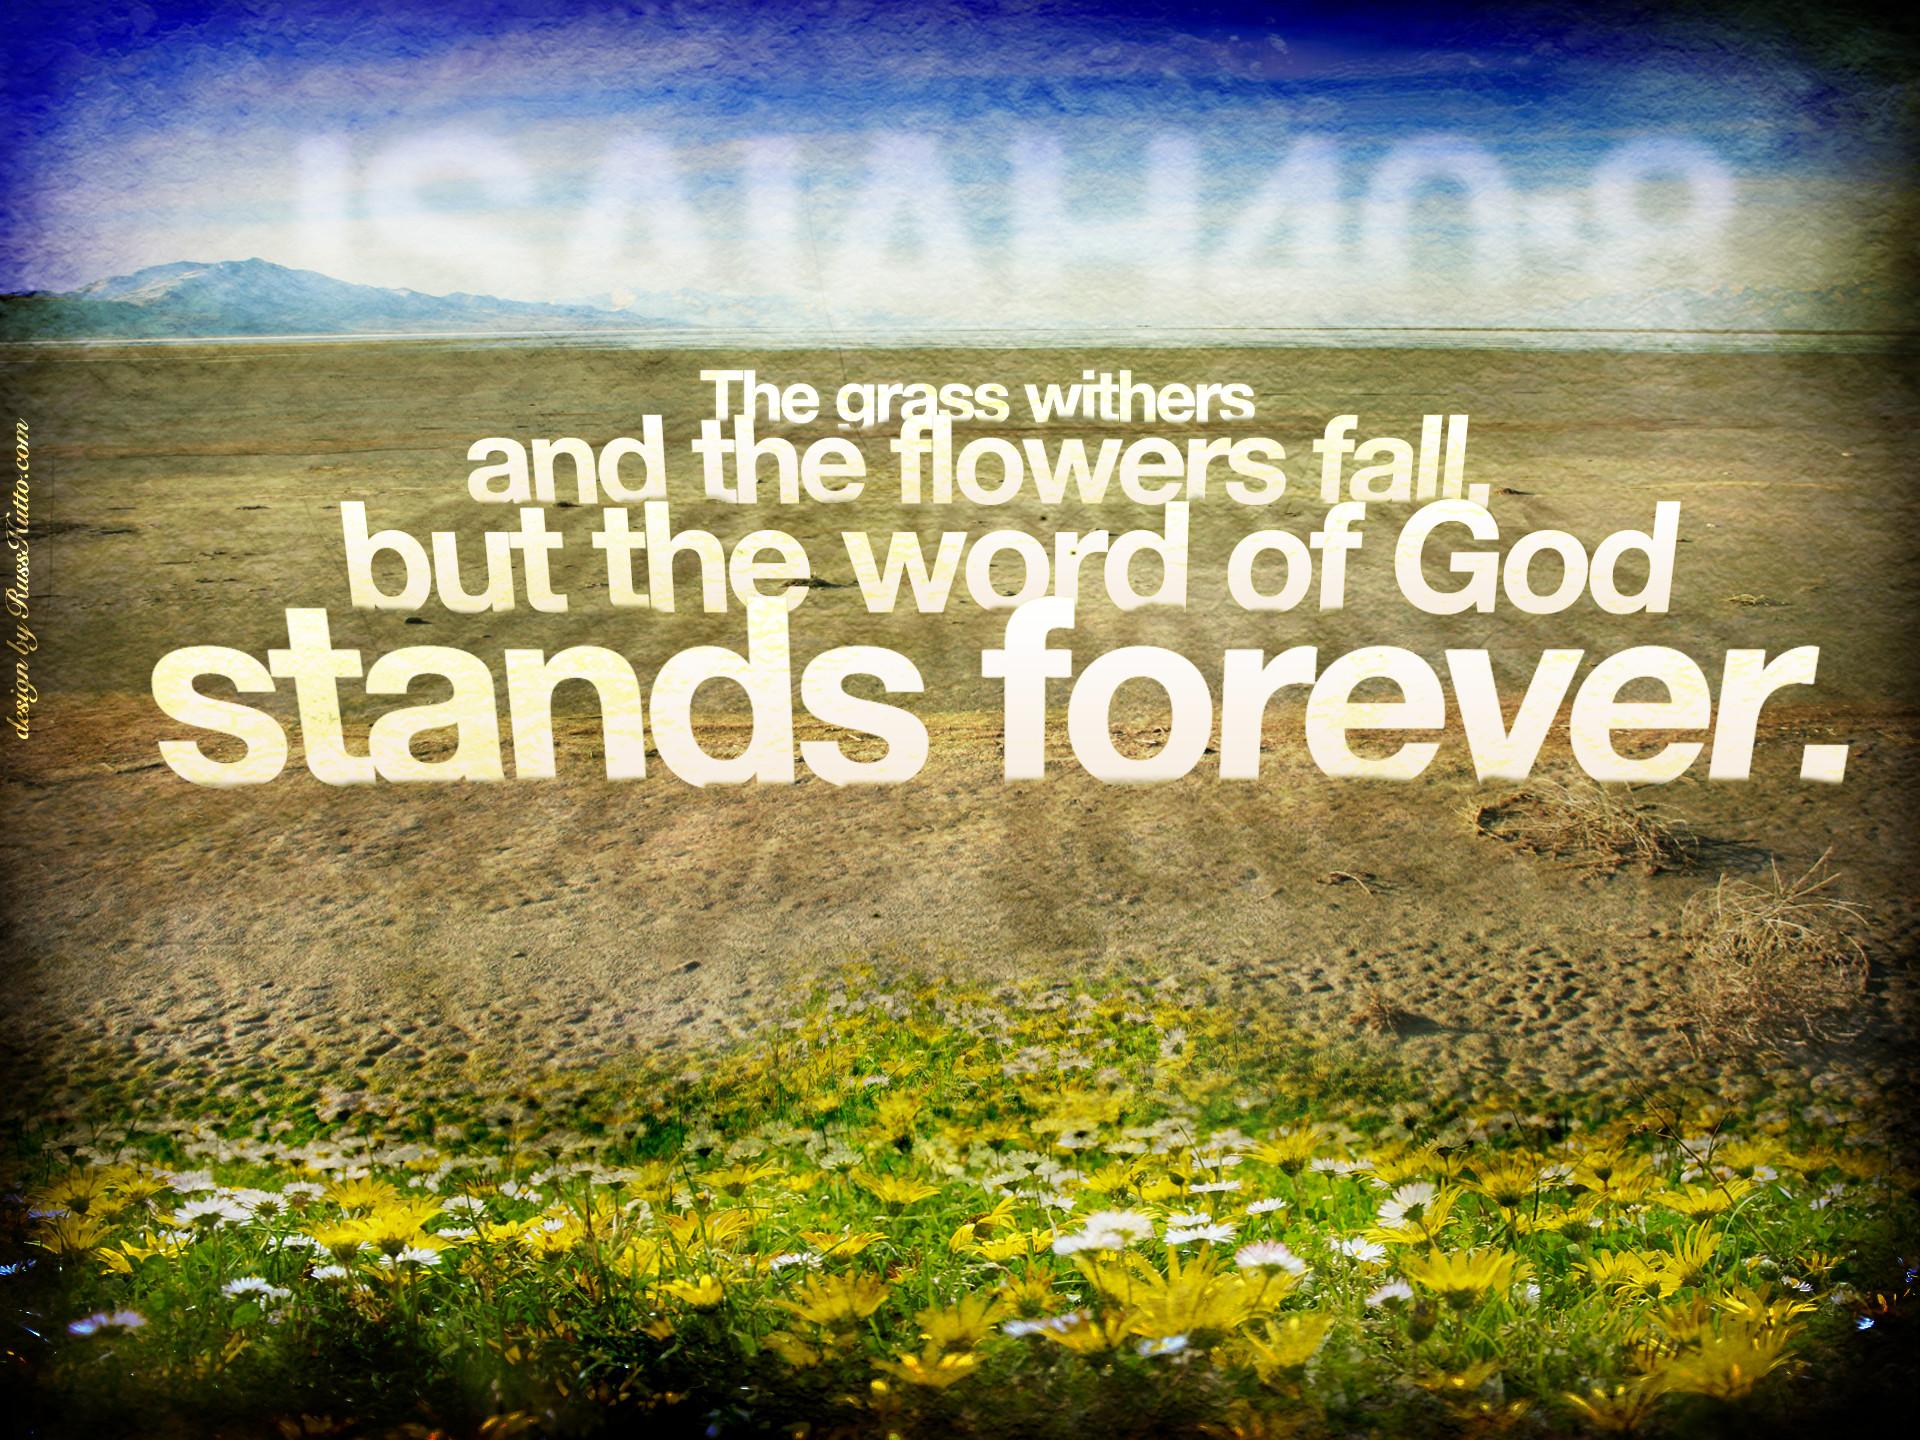 Isaiah 40:8 – Word of God